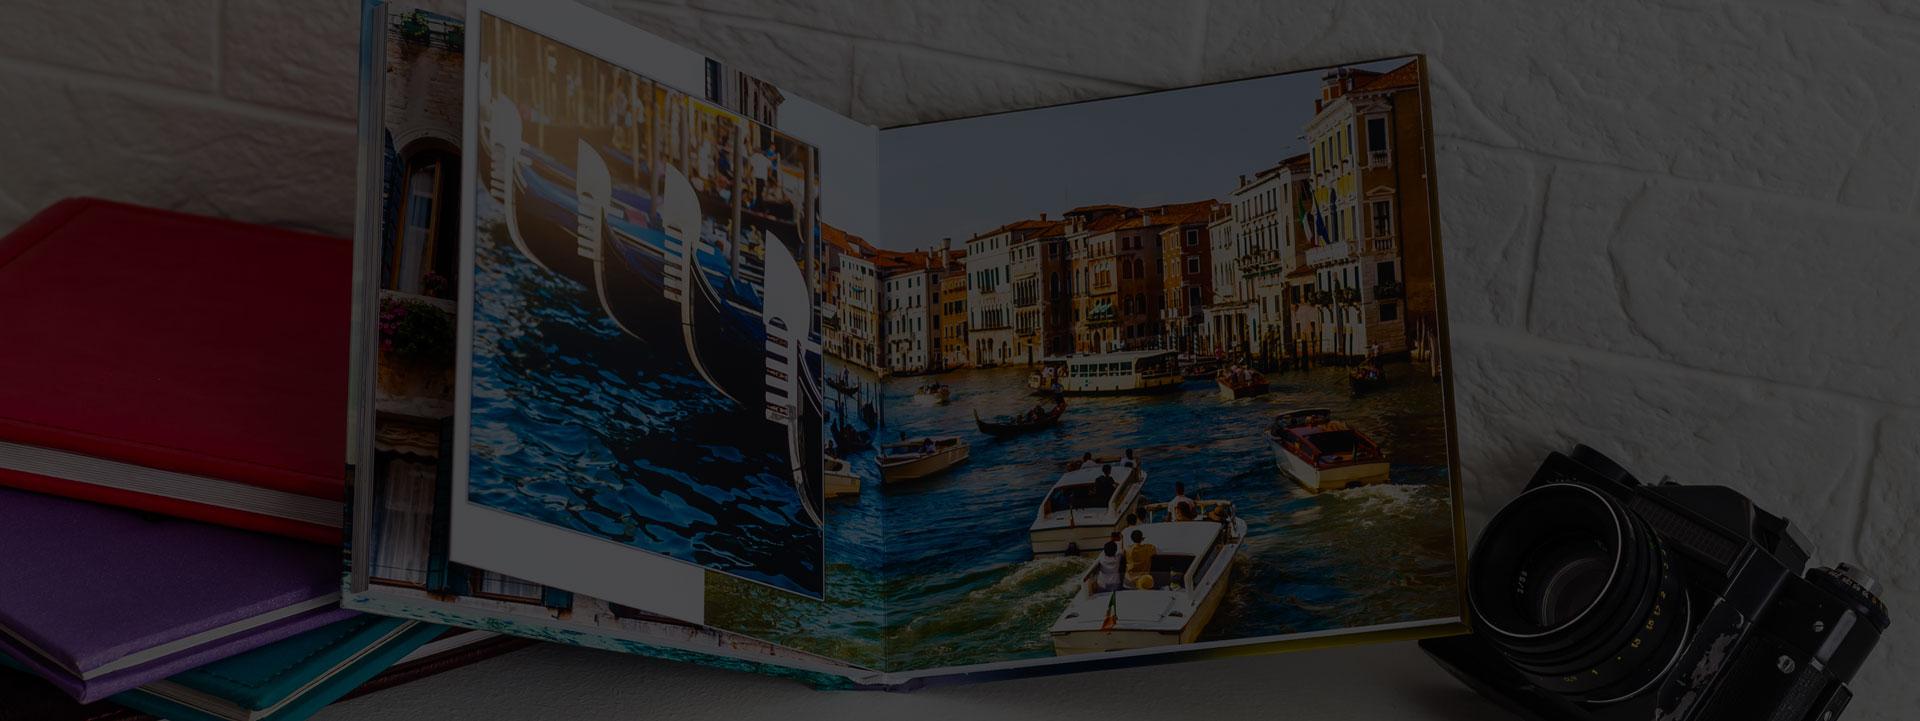 ENRICH YOUR PHOTO BOOK